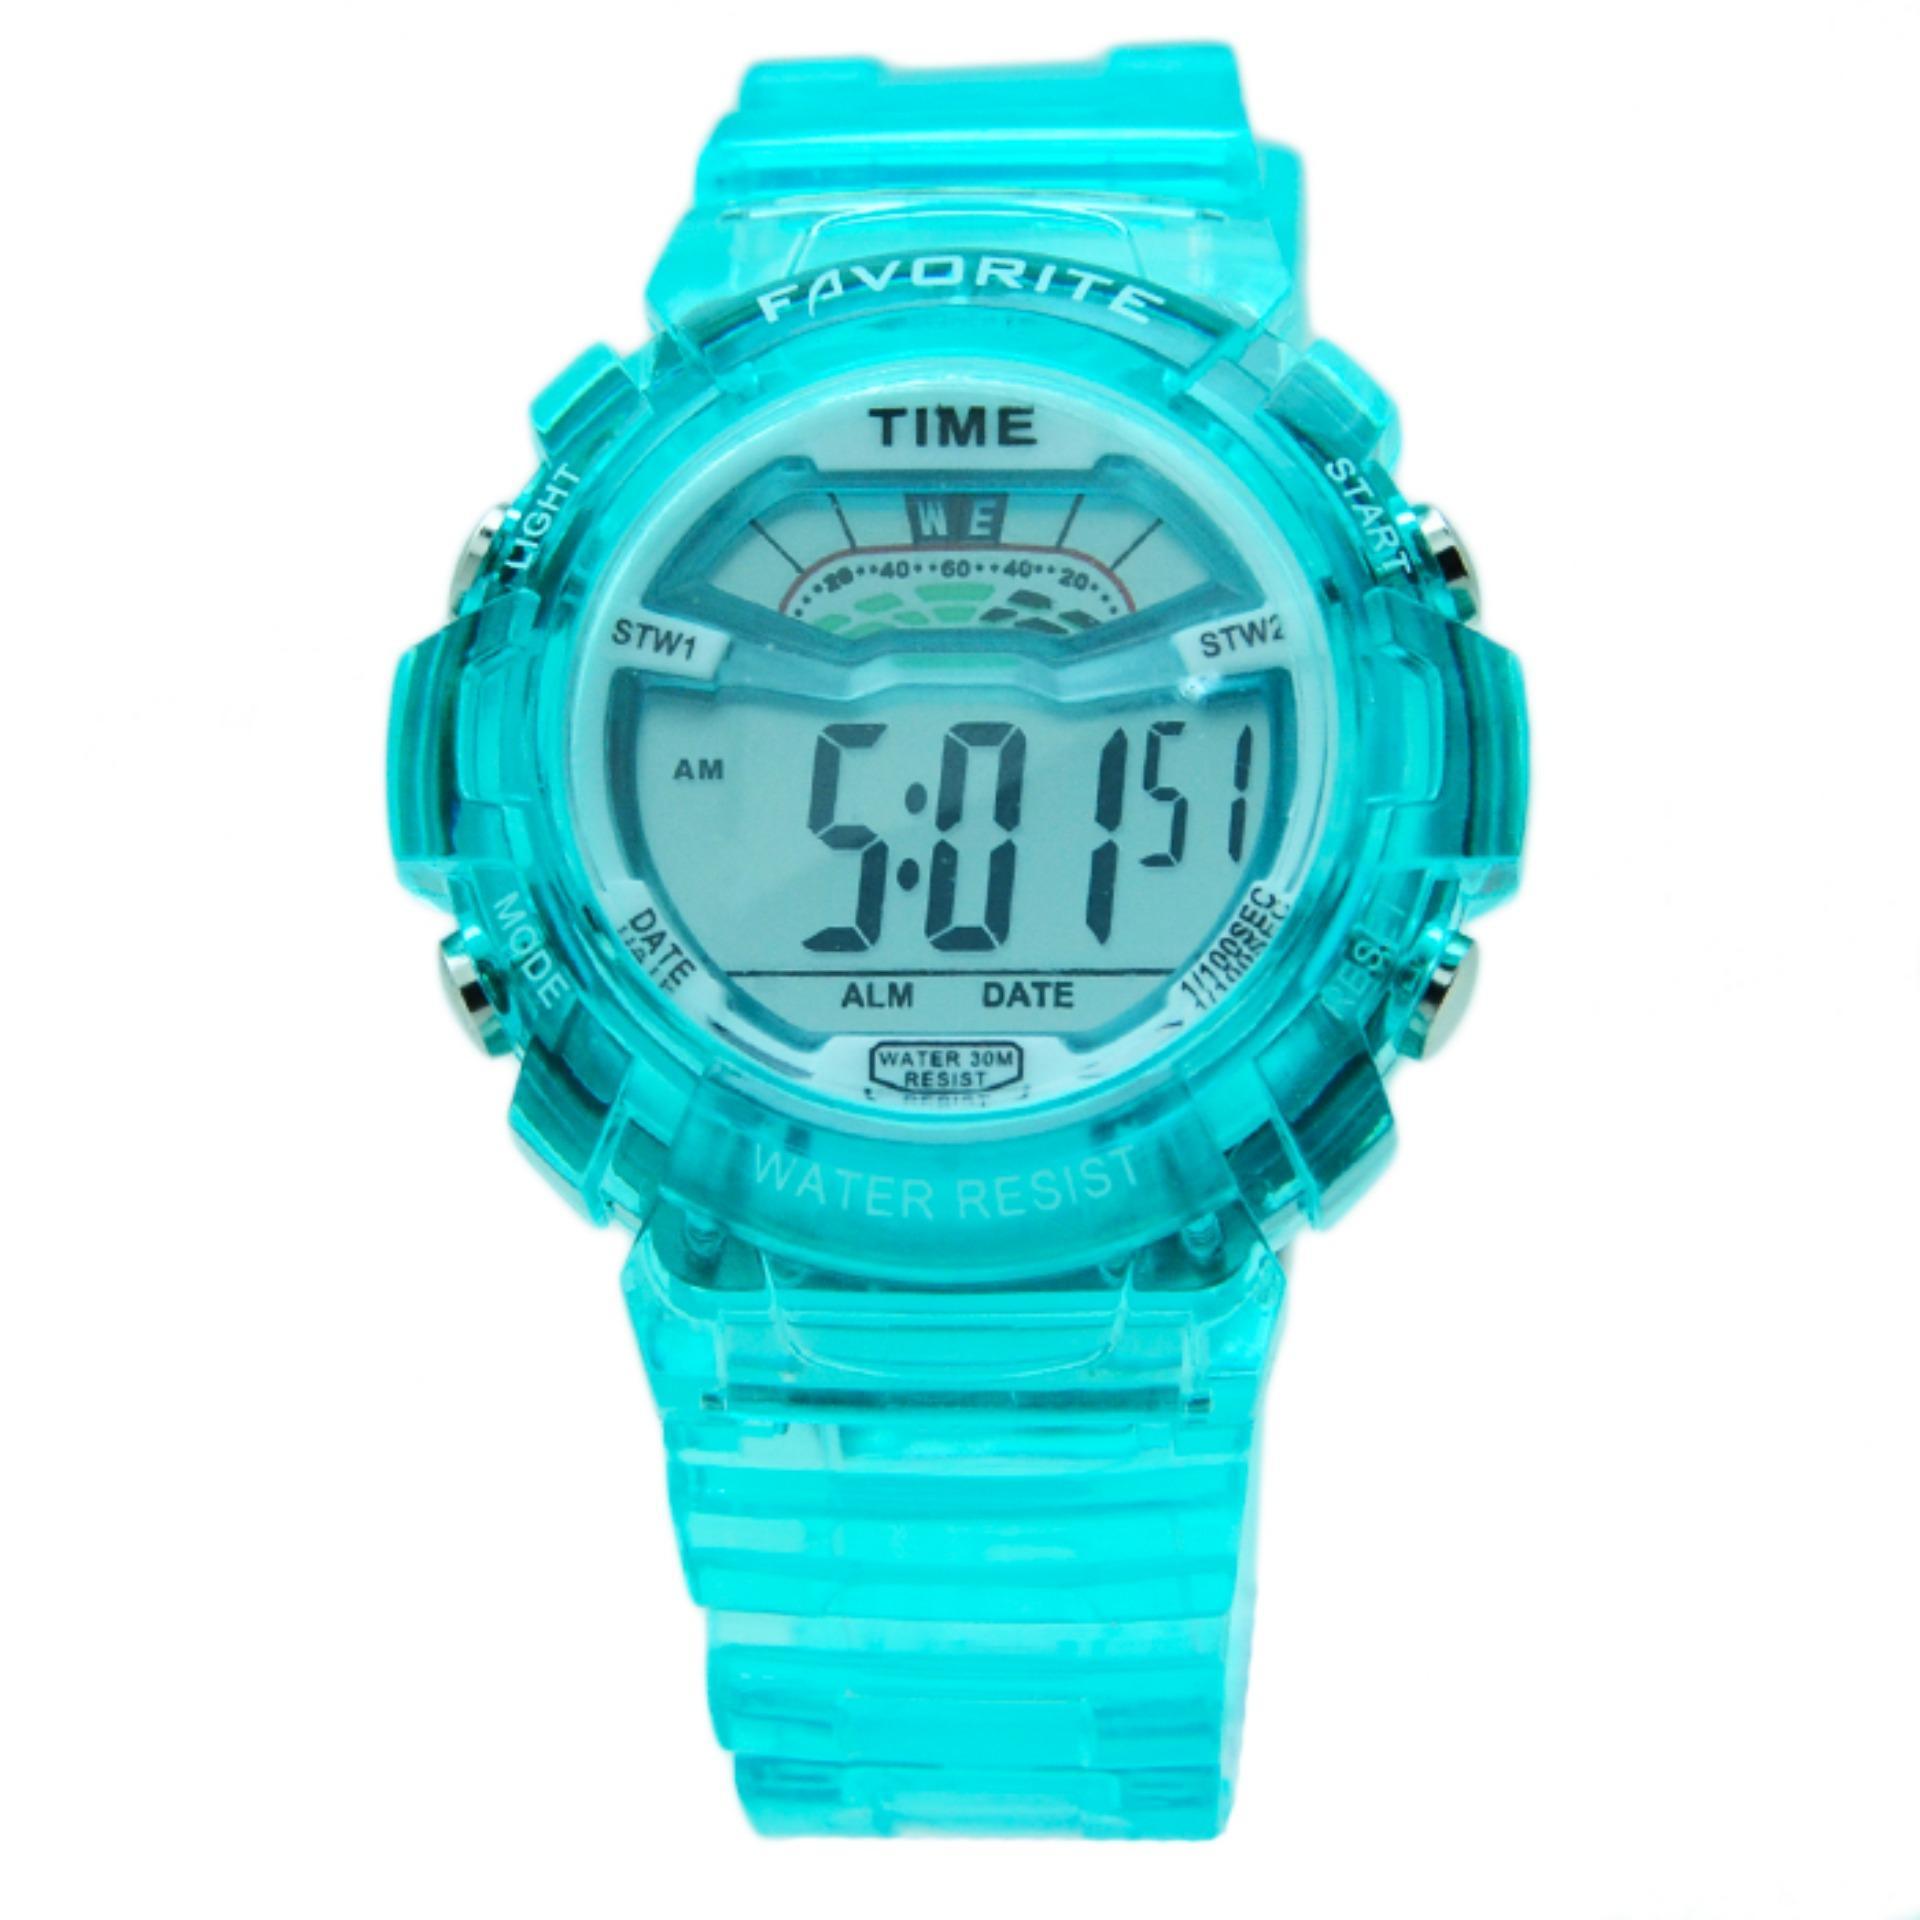 Skmei Digital Sport Watch Water Resistant 50m Dg1206 Jam Tangan Pria Wanita 1206 Thin 30m Black Favourite Fav02 Biru